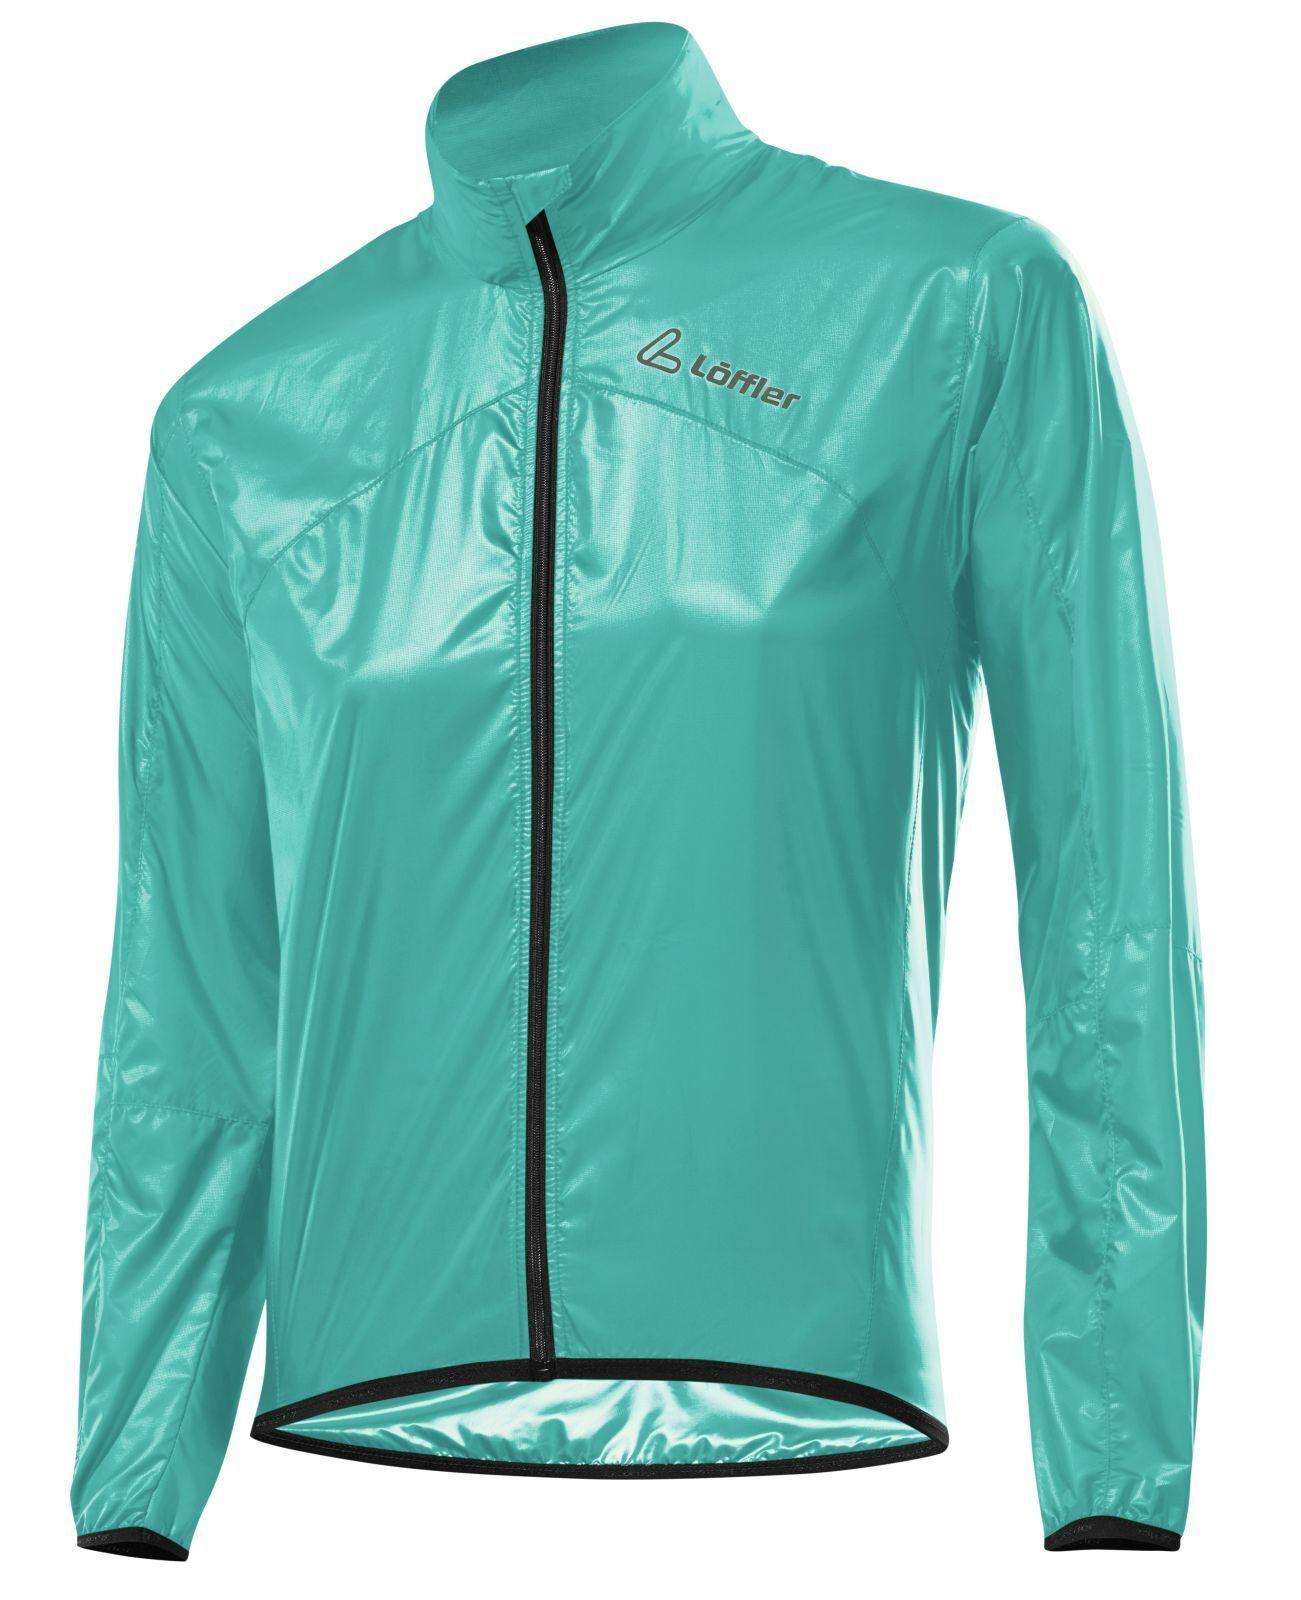 Löffler Damen Radsport Bike Jacke Windshell pool blau